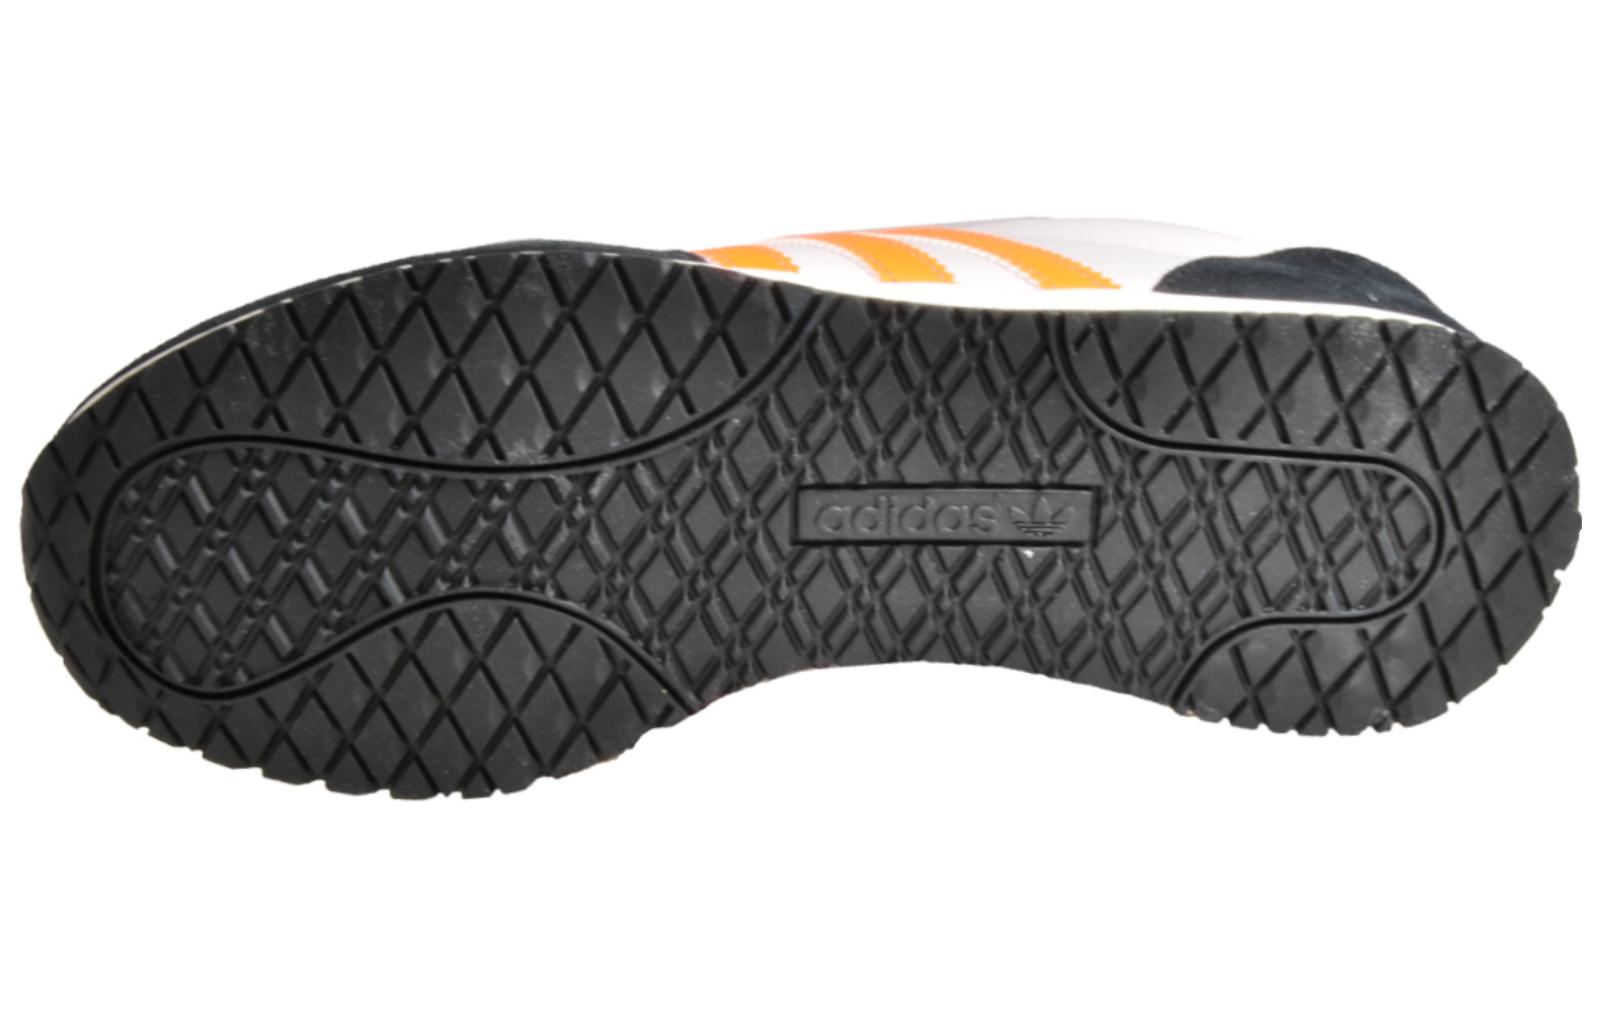 brand new 56df1 9b0da Adidas Originals Adistar Racer Classic Casual Retro Trainers Sneakers